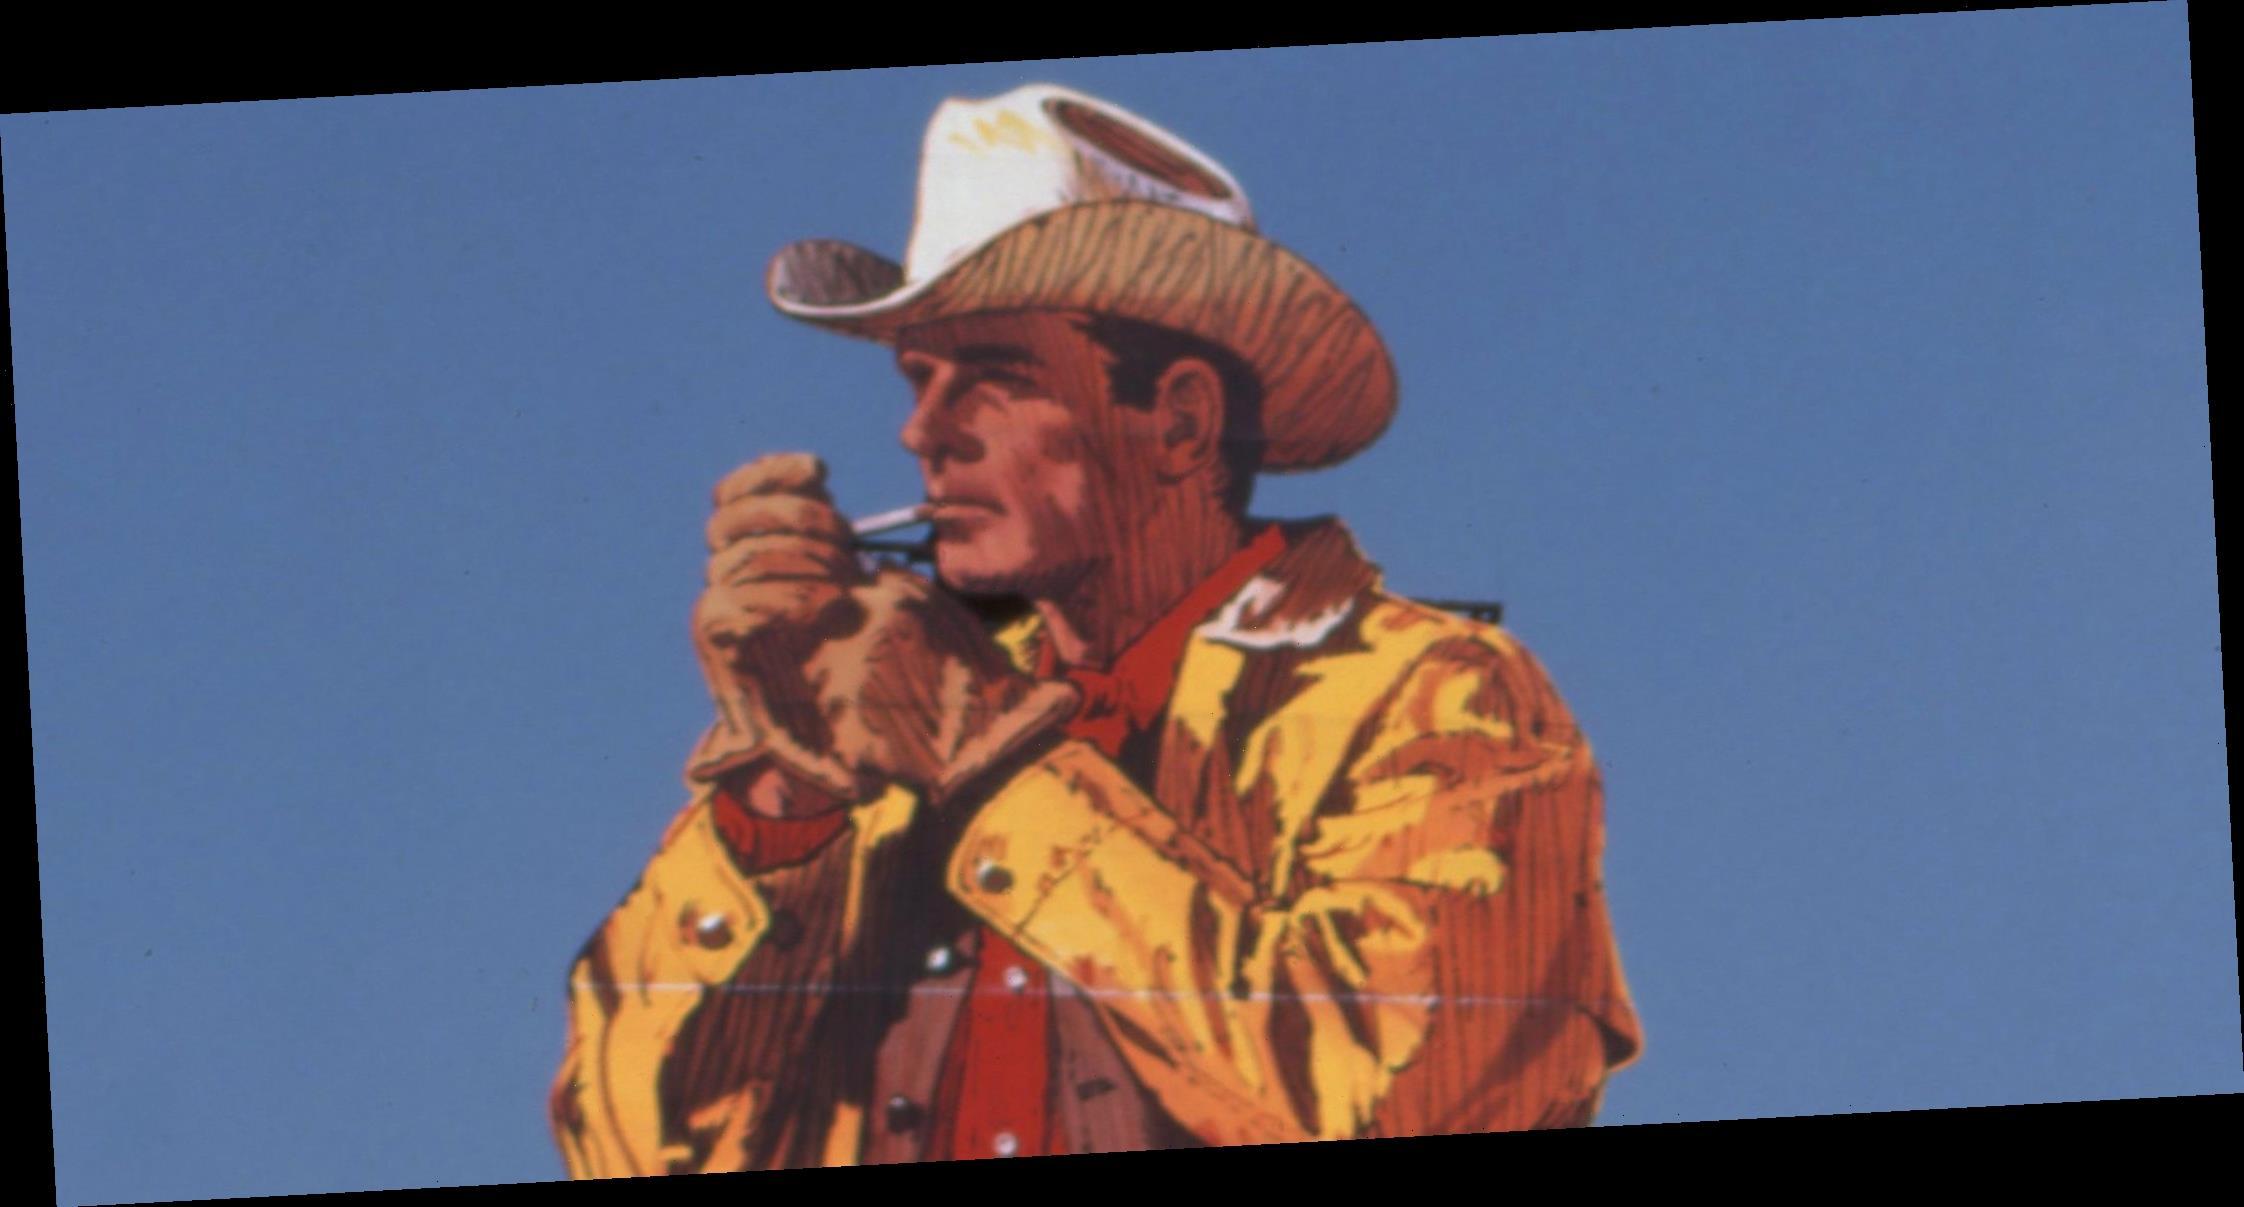 The Original 'Marlboro Man' Has Passed Away at 90